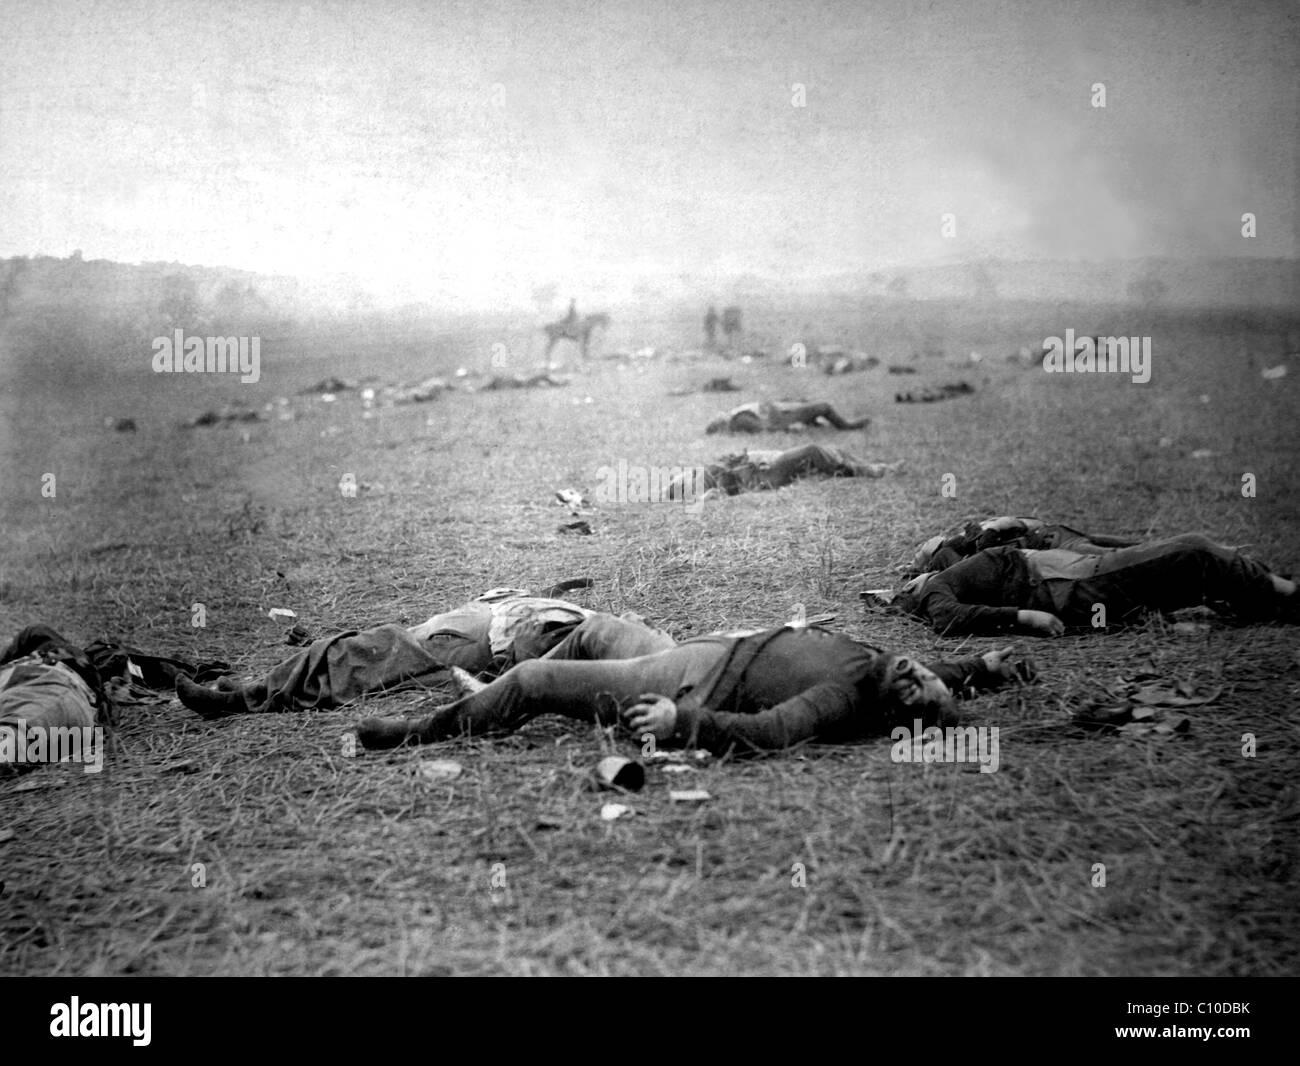 Battlefield of Gettysburg - Stock Image